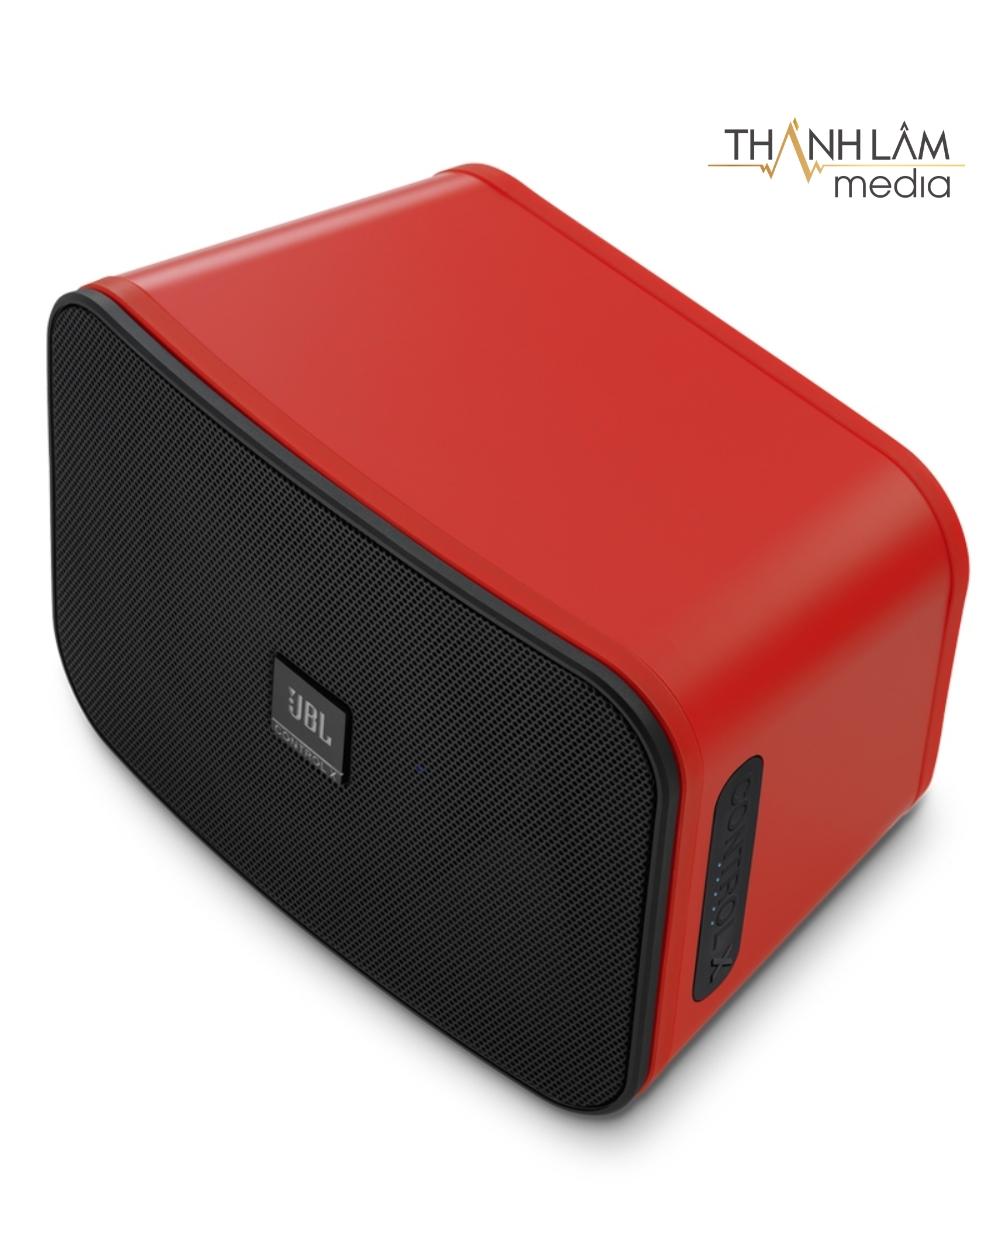 thanhlammedia-jbl-control-x-wireless-NEU29-products-option-image-470-1498539360-FC12Q